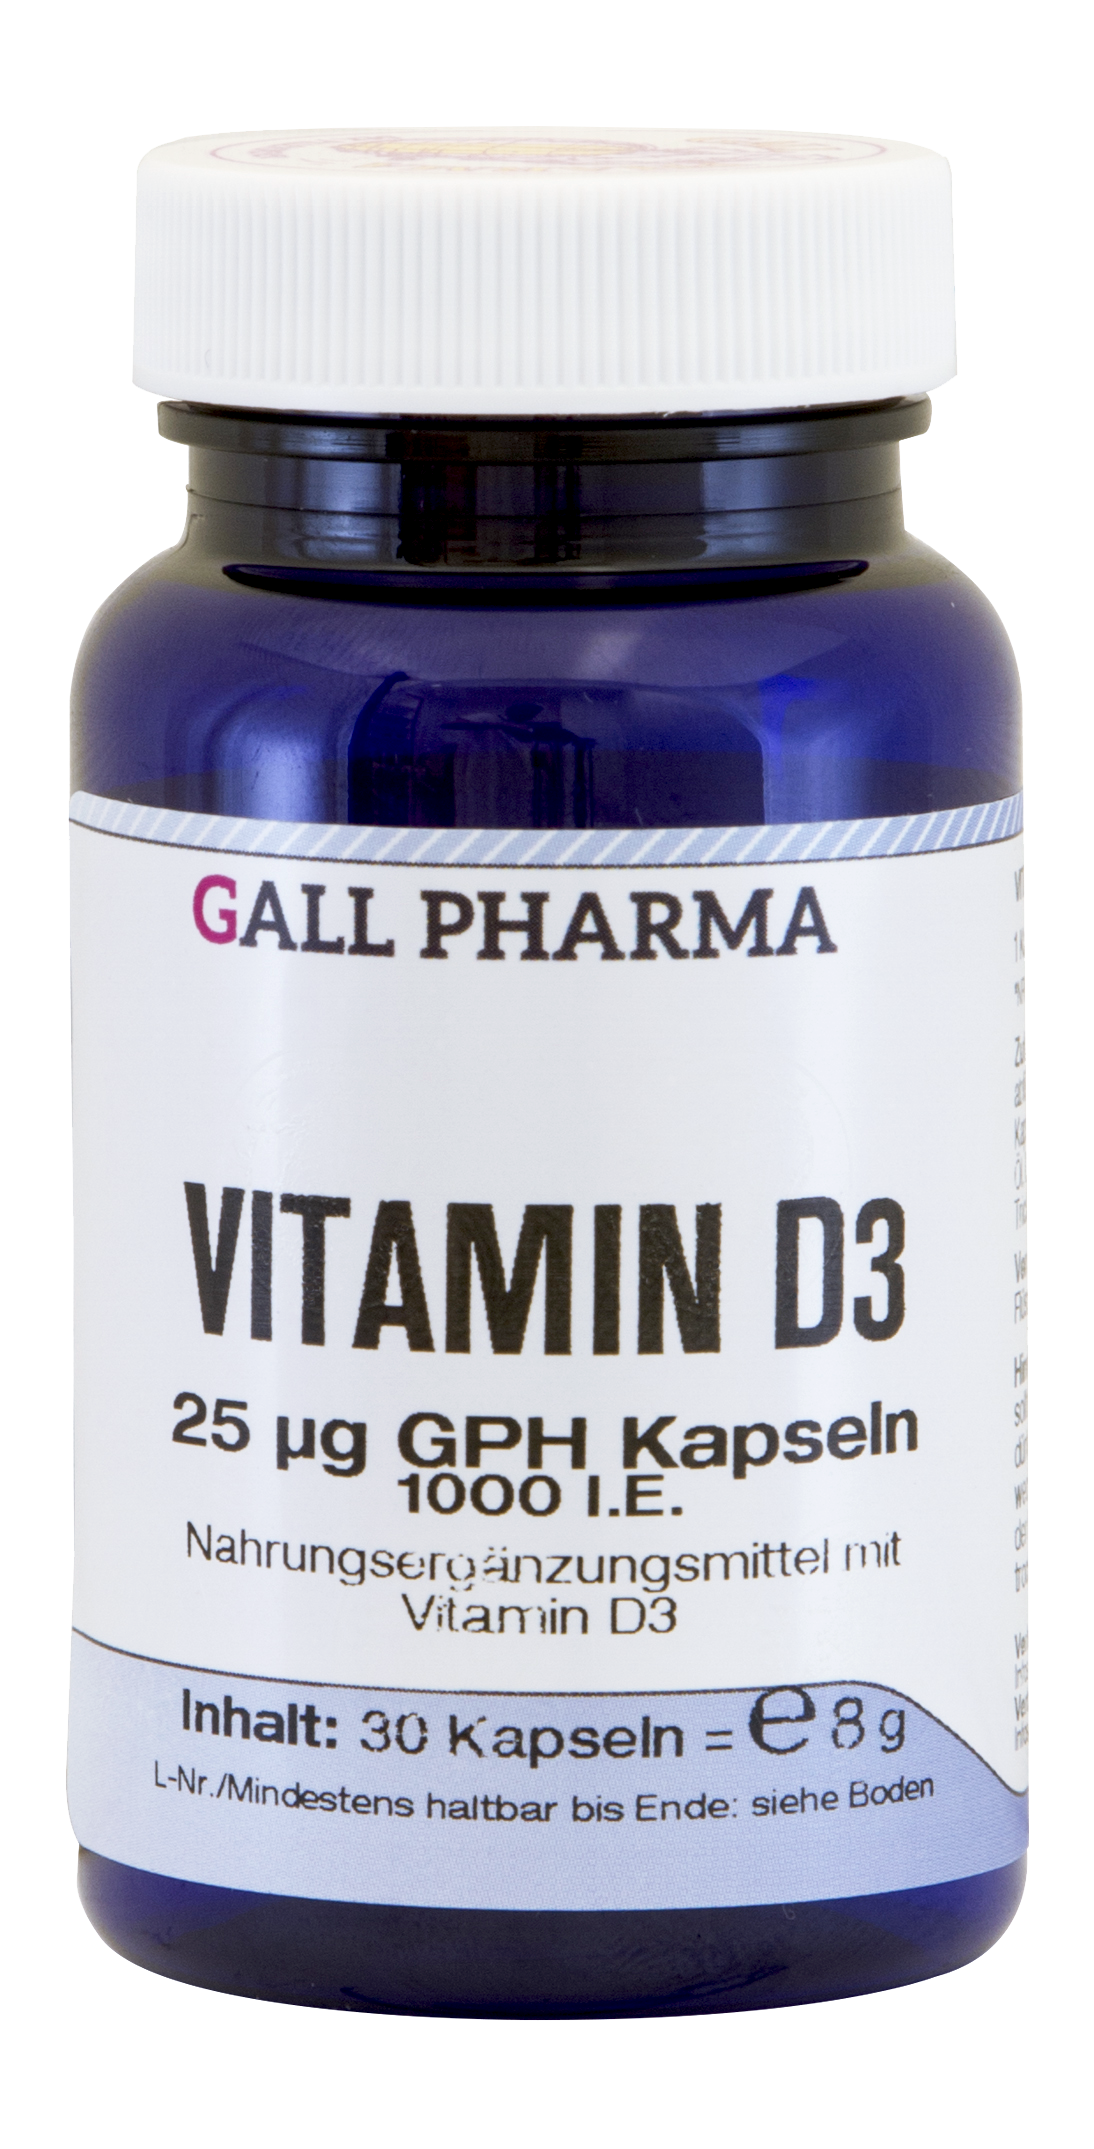 Vitamin D3 25 µg GPH Kapseln